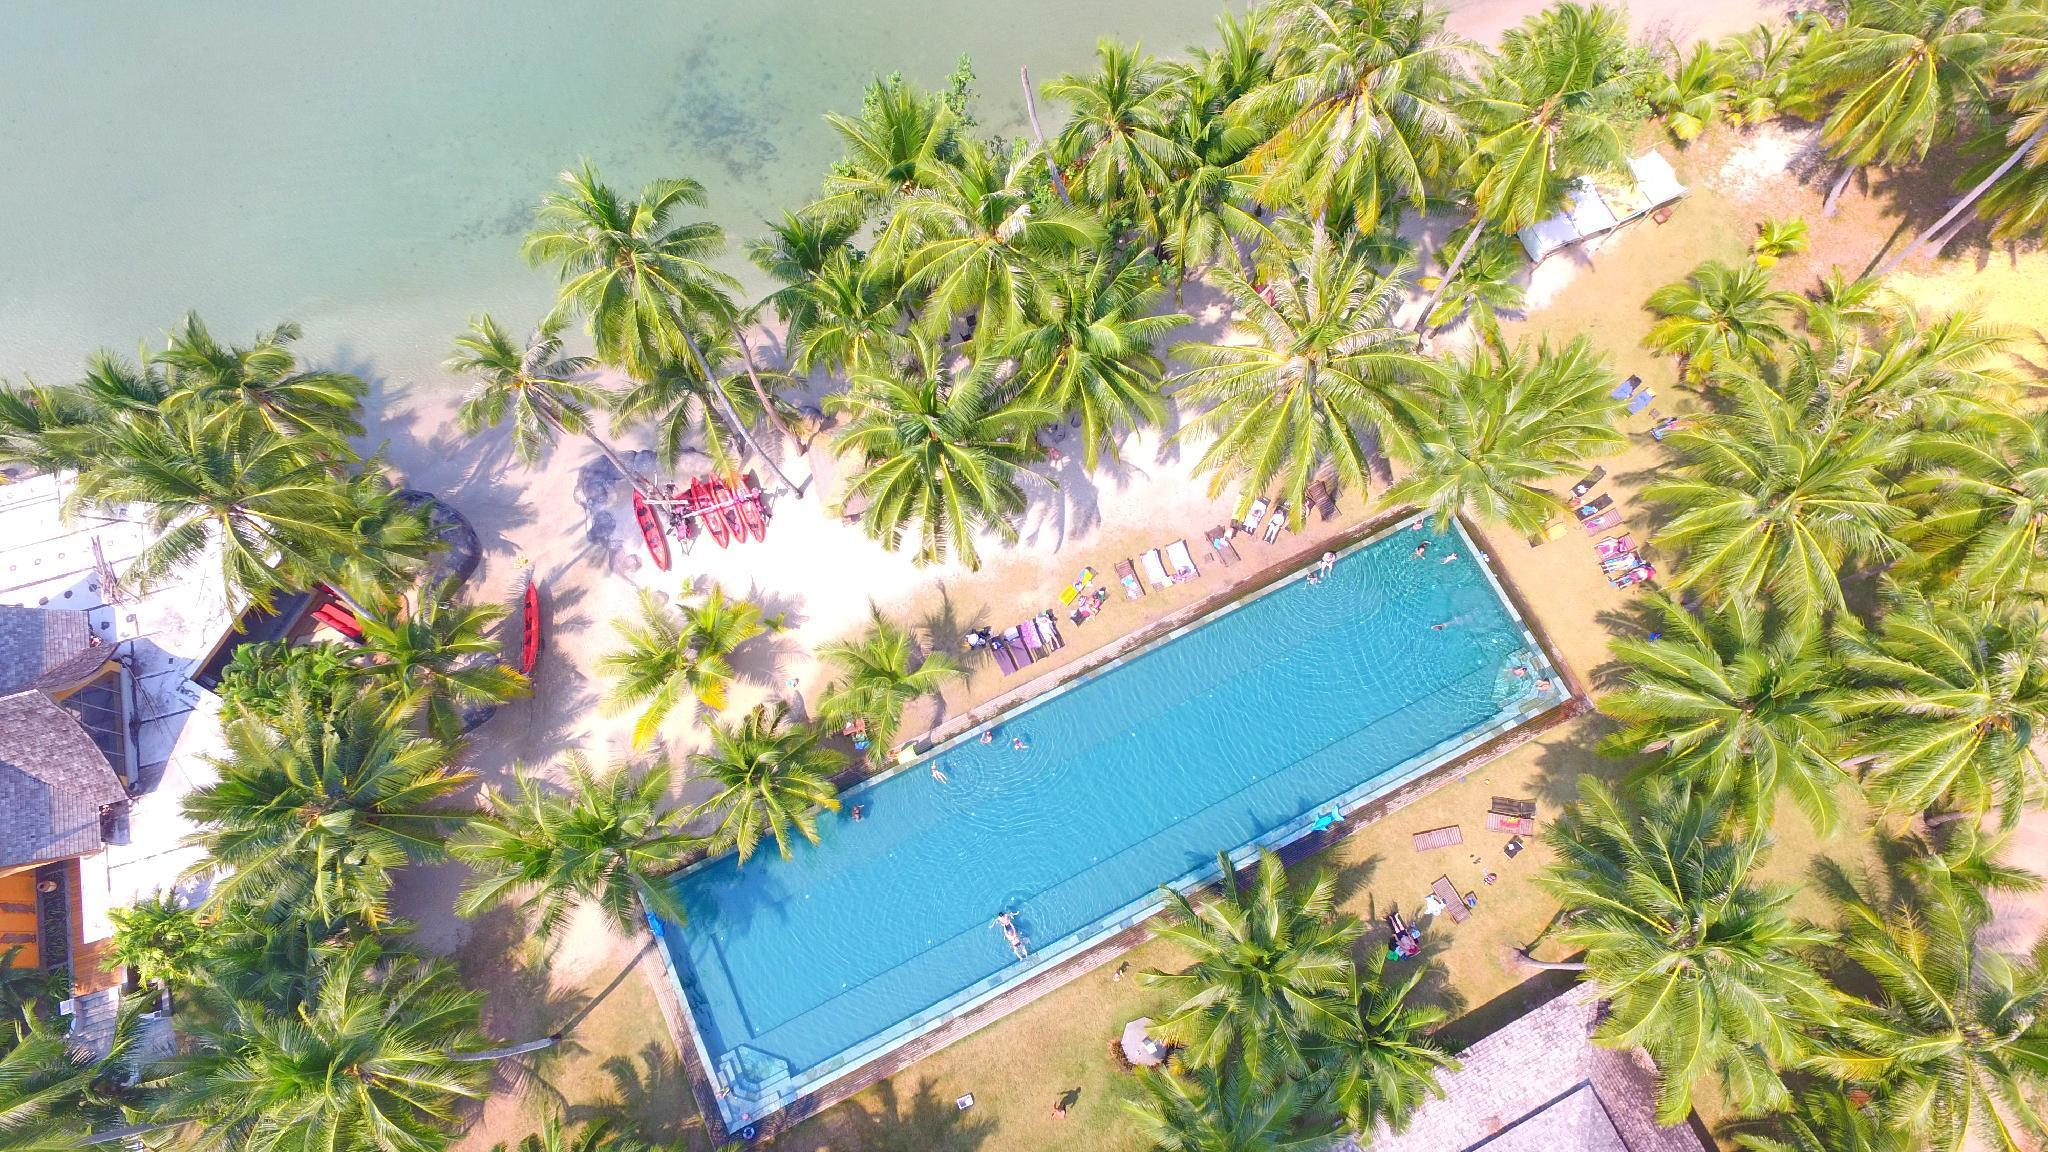 Peninsula Beach Resort Koh Chang เพนนินซูลา บีช รีสอร์ต เกาะช้าง